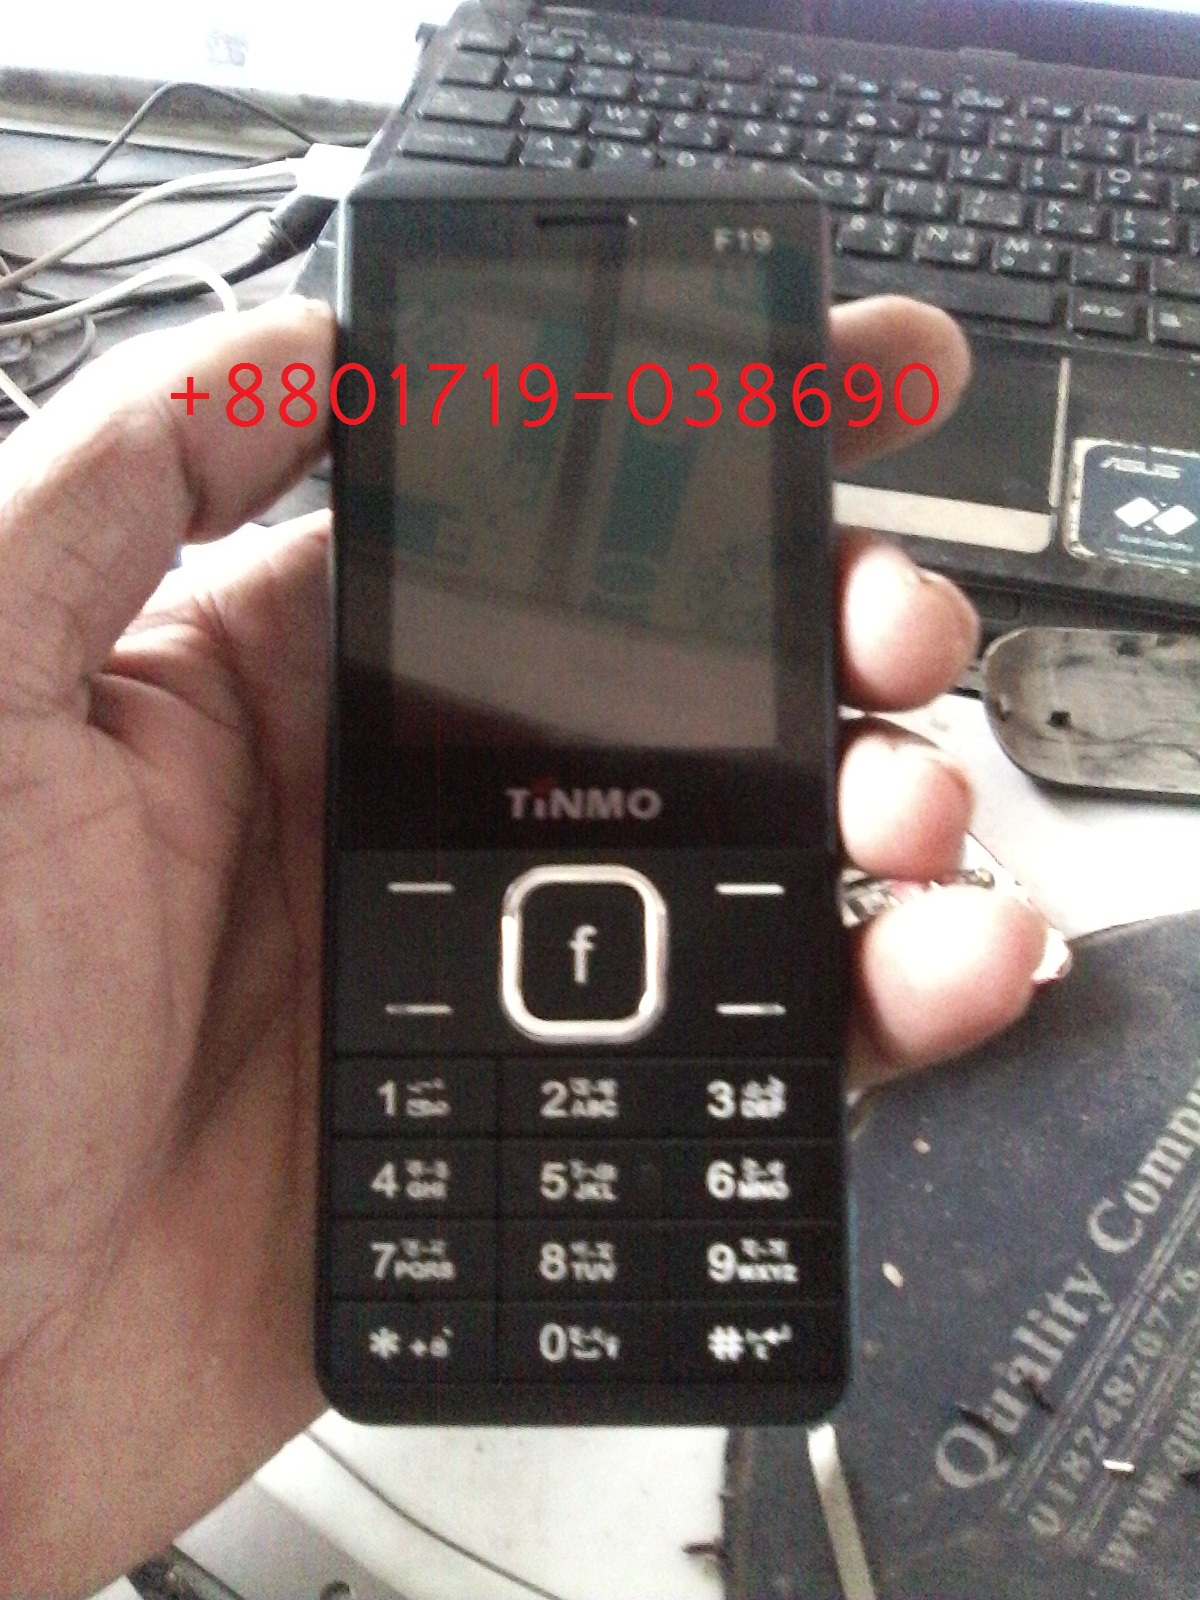 LITE TEL LT1802 SPD 6531E FLASH FILE 100% OK BY KHOKON | All Flash